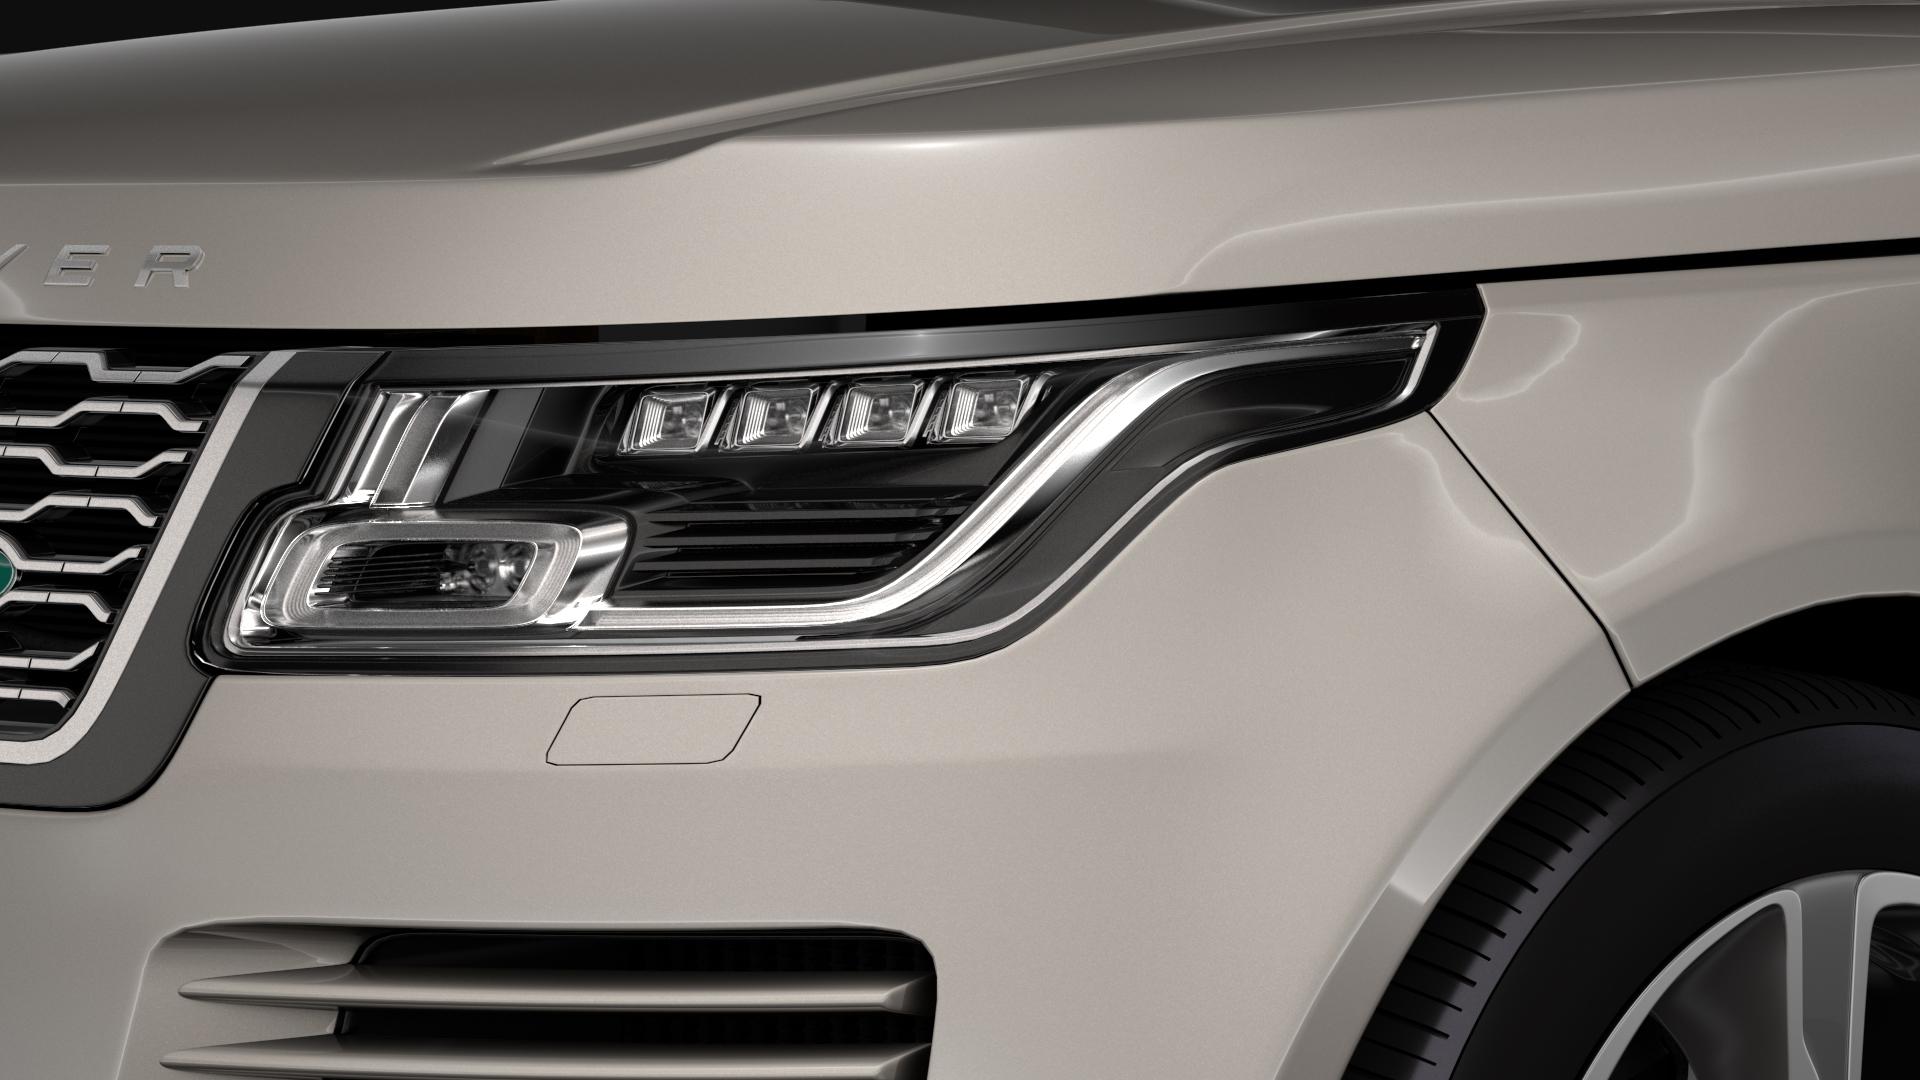 range rover hybrid lwb l405 2018 3d model max fbx c4d lwo ma mb hrc xsi obj 277420